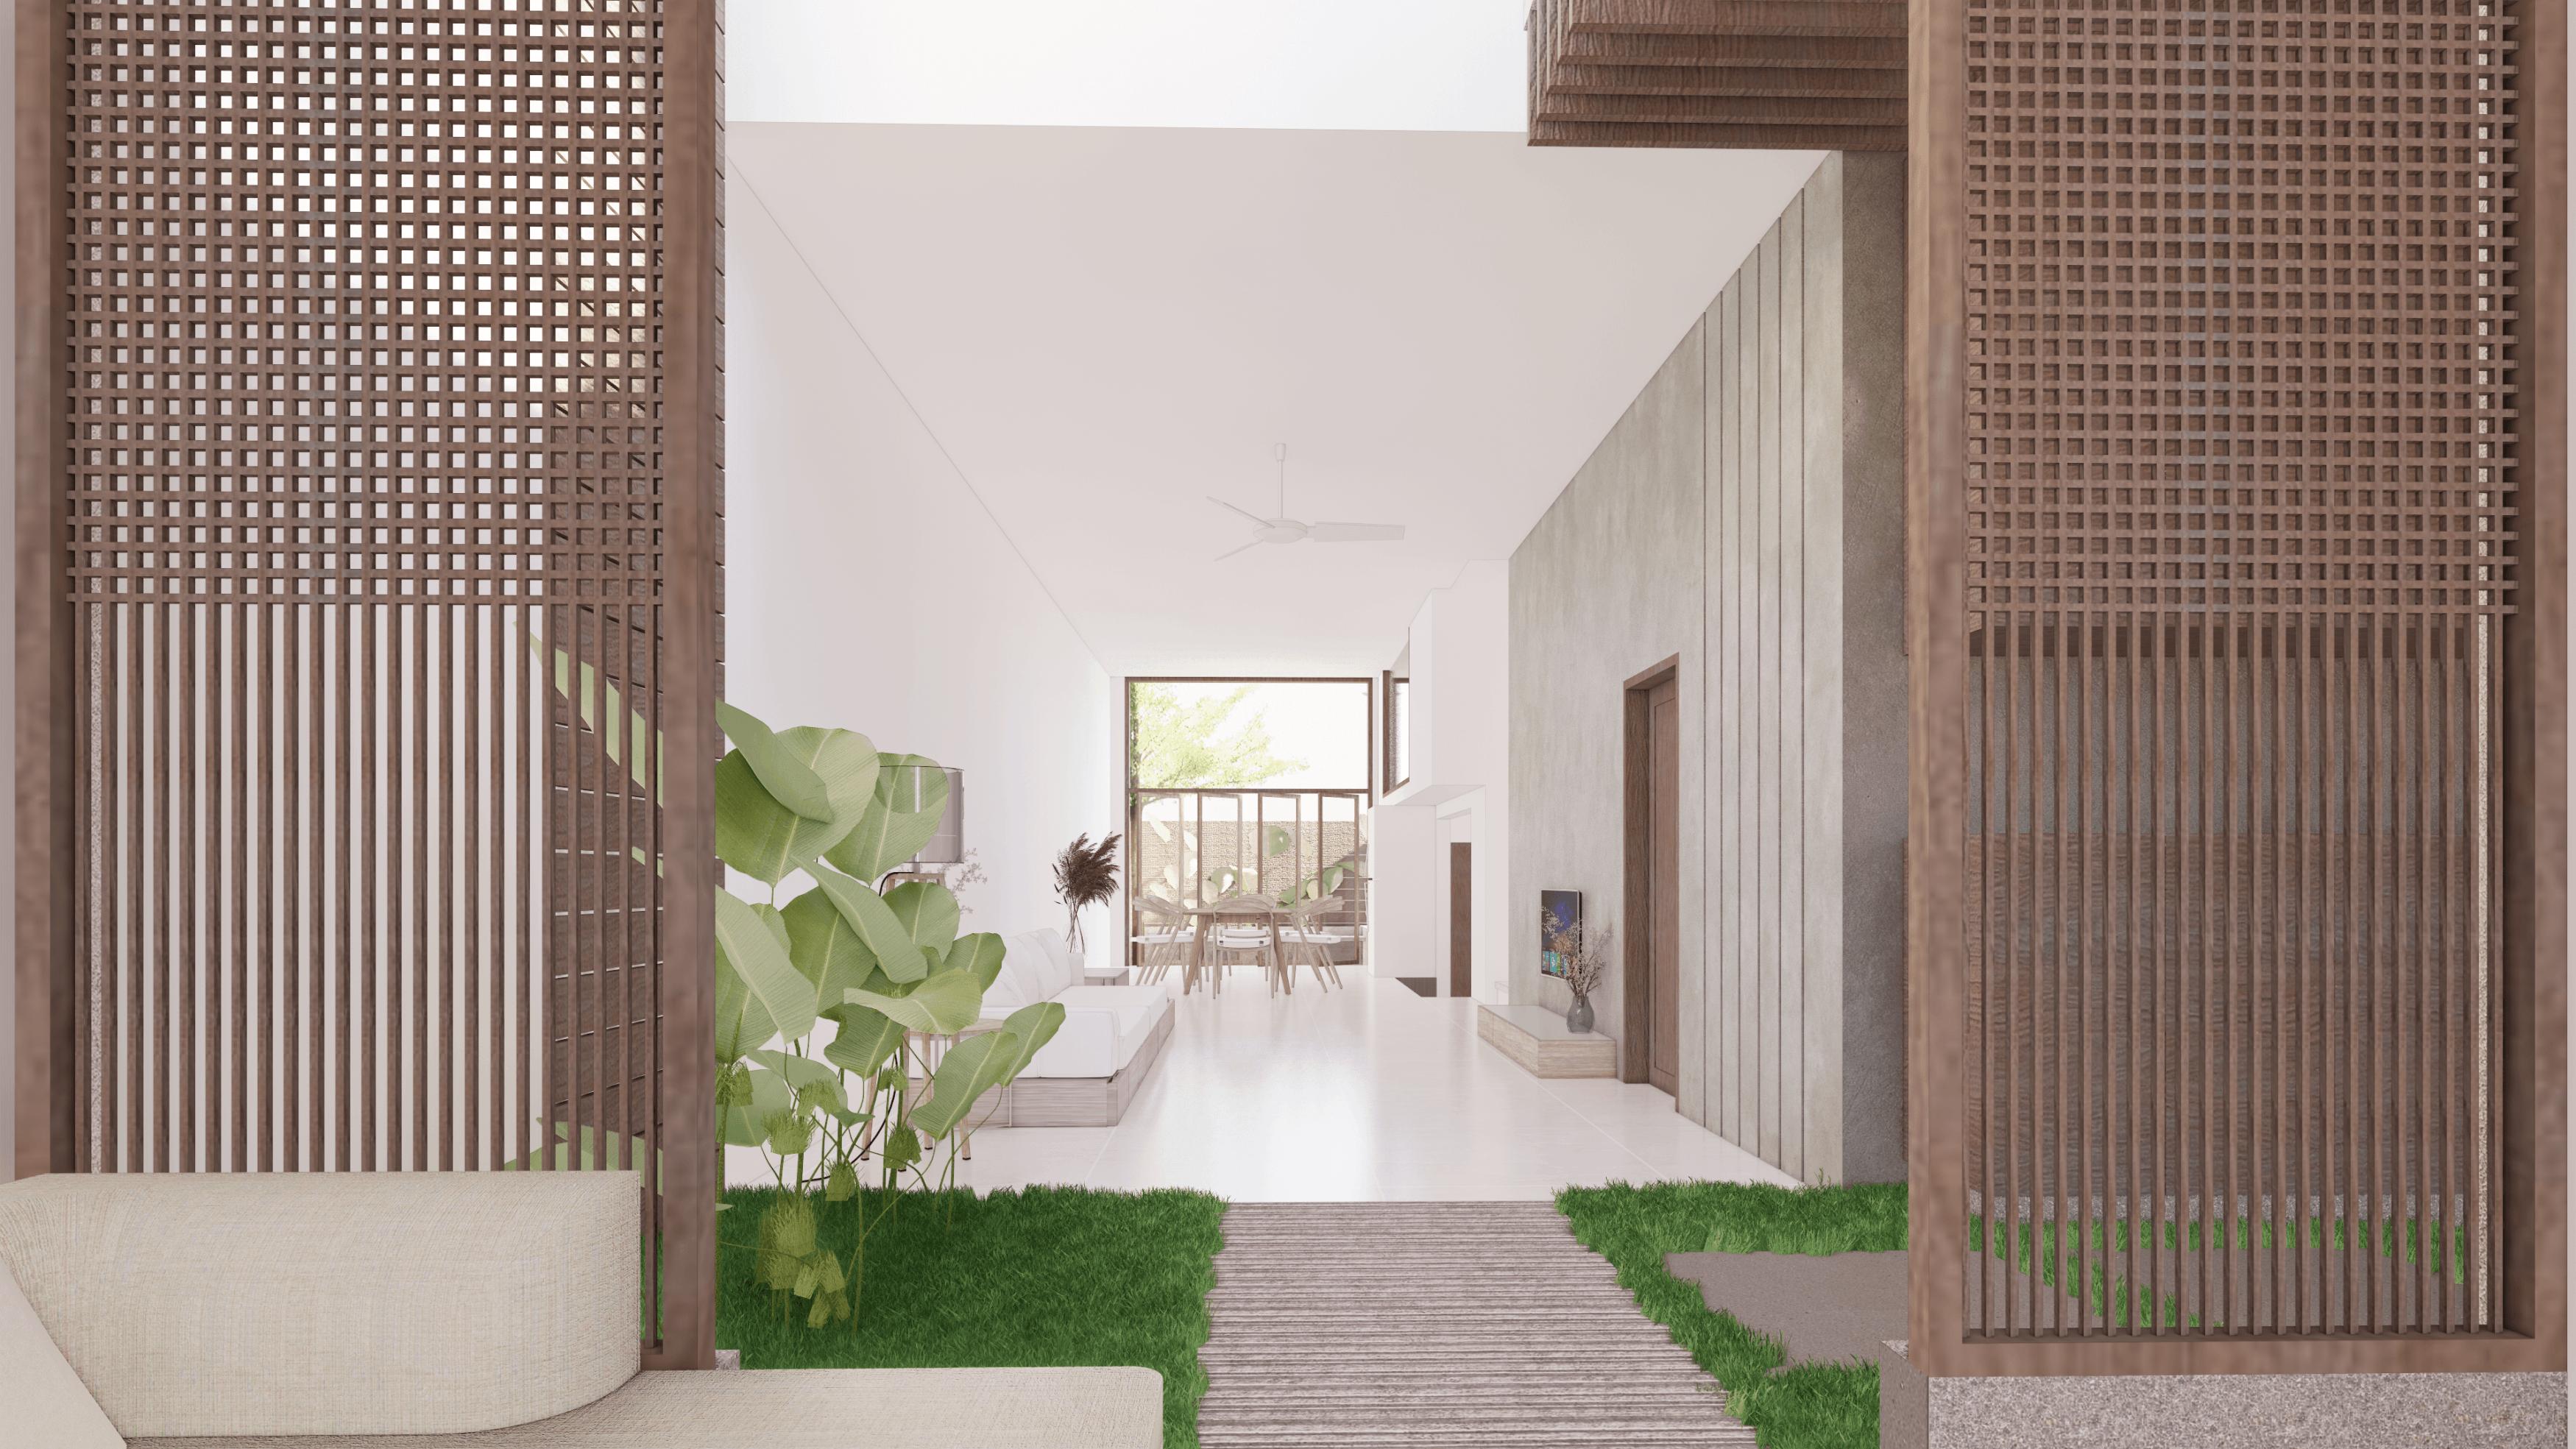 Dans Studio Mr Ar House Surakarta, Kota Surakarta, Jawa Tengah, Indonesia Surakarta, Kota Surakarta, Jawa Tengah, Indonesia Dans-Architect-Mr-Ar-House   117671